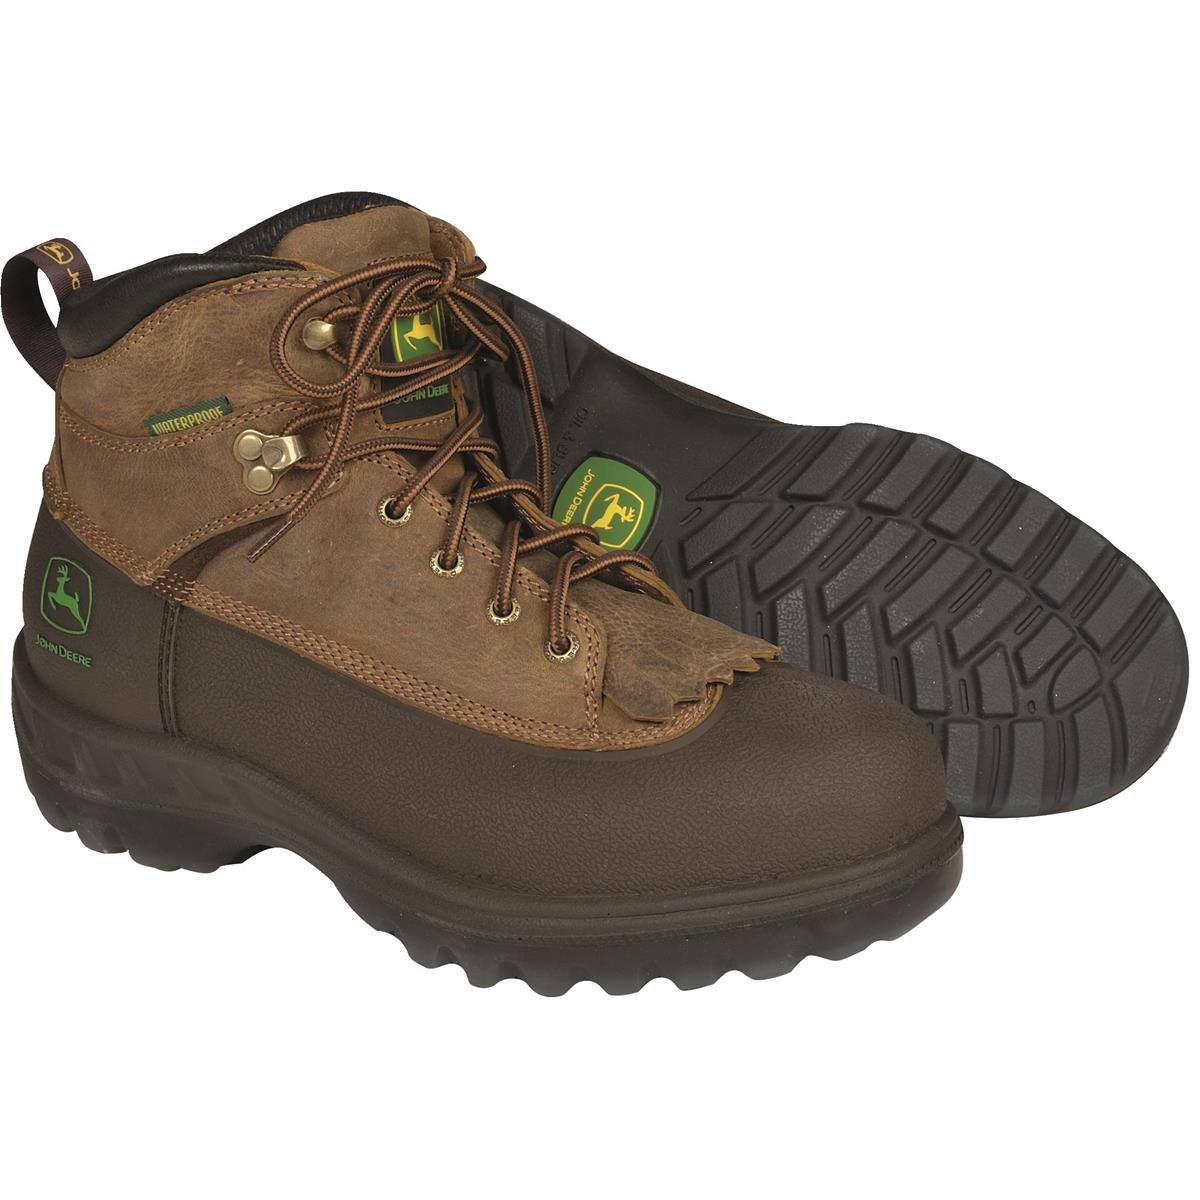 john deere boots john deere steel toe wct boots qszrmup